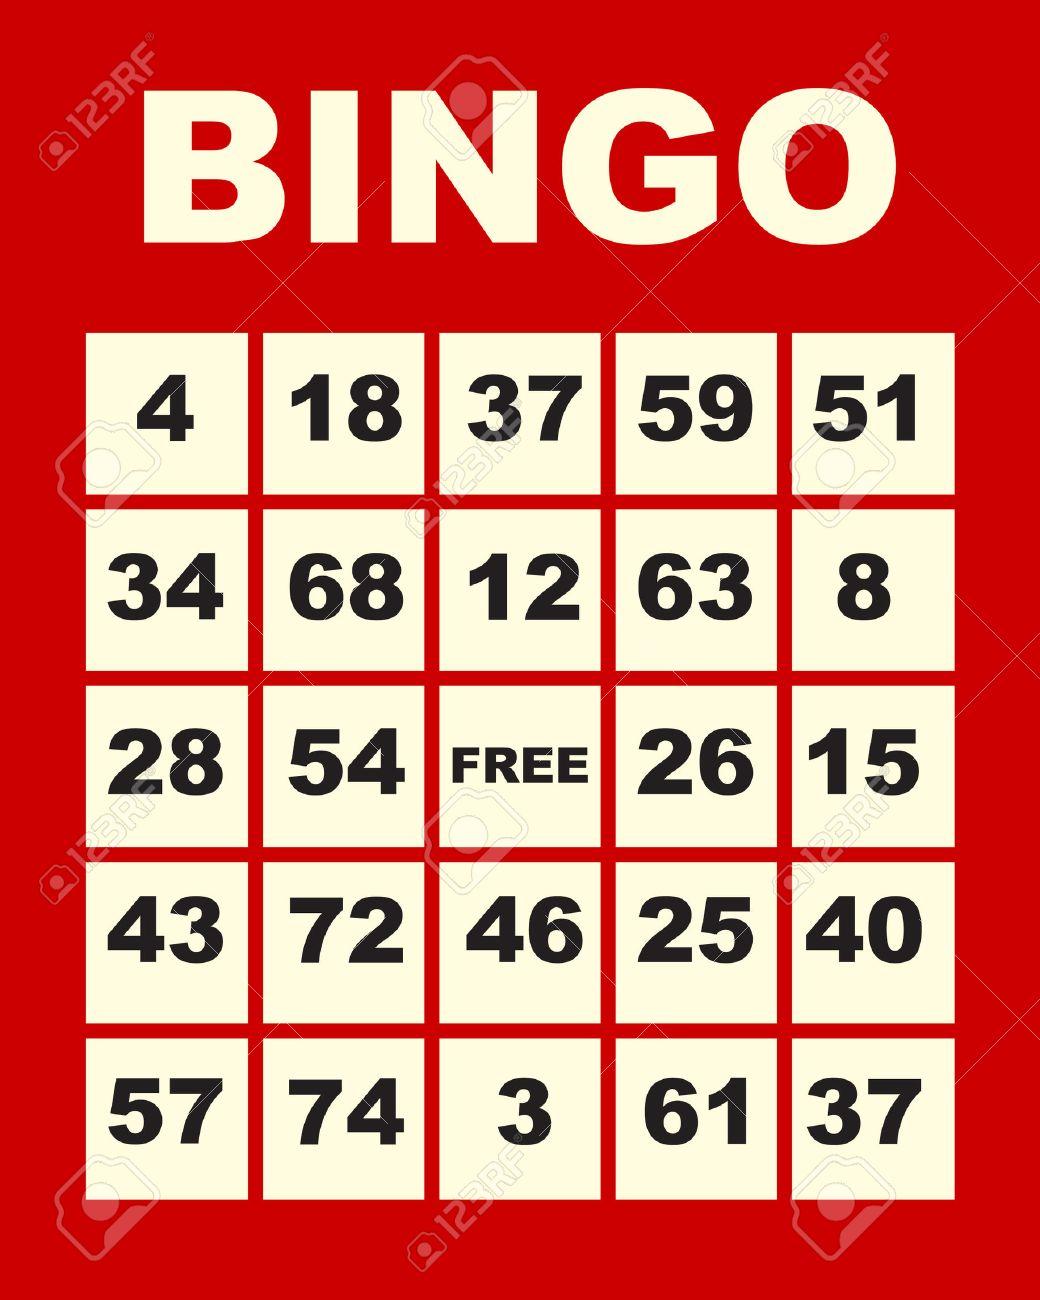 art illustration of one red bingo card Stock Vector - 8101243